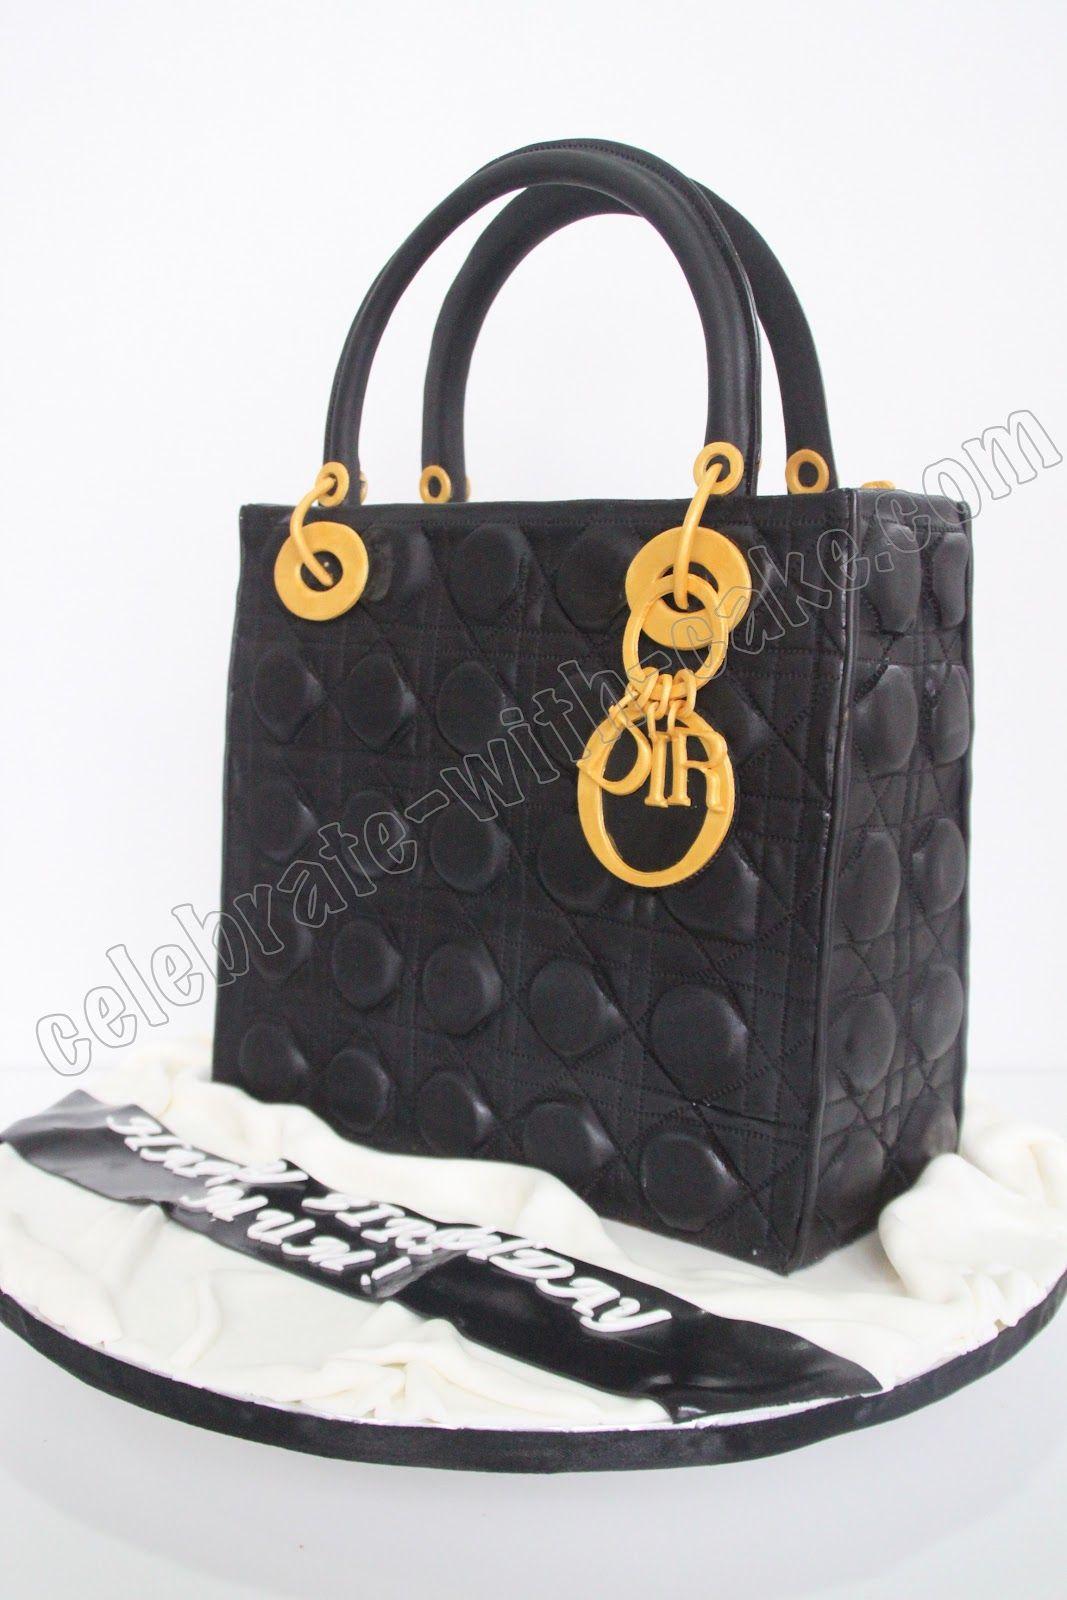 ddf47d2eaff89 christian dior cake purses or bags   Celebrate with Cake!   Purse ...